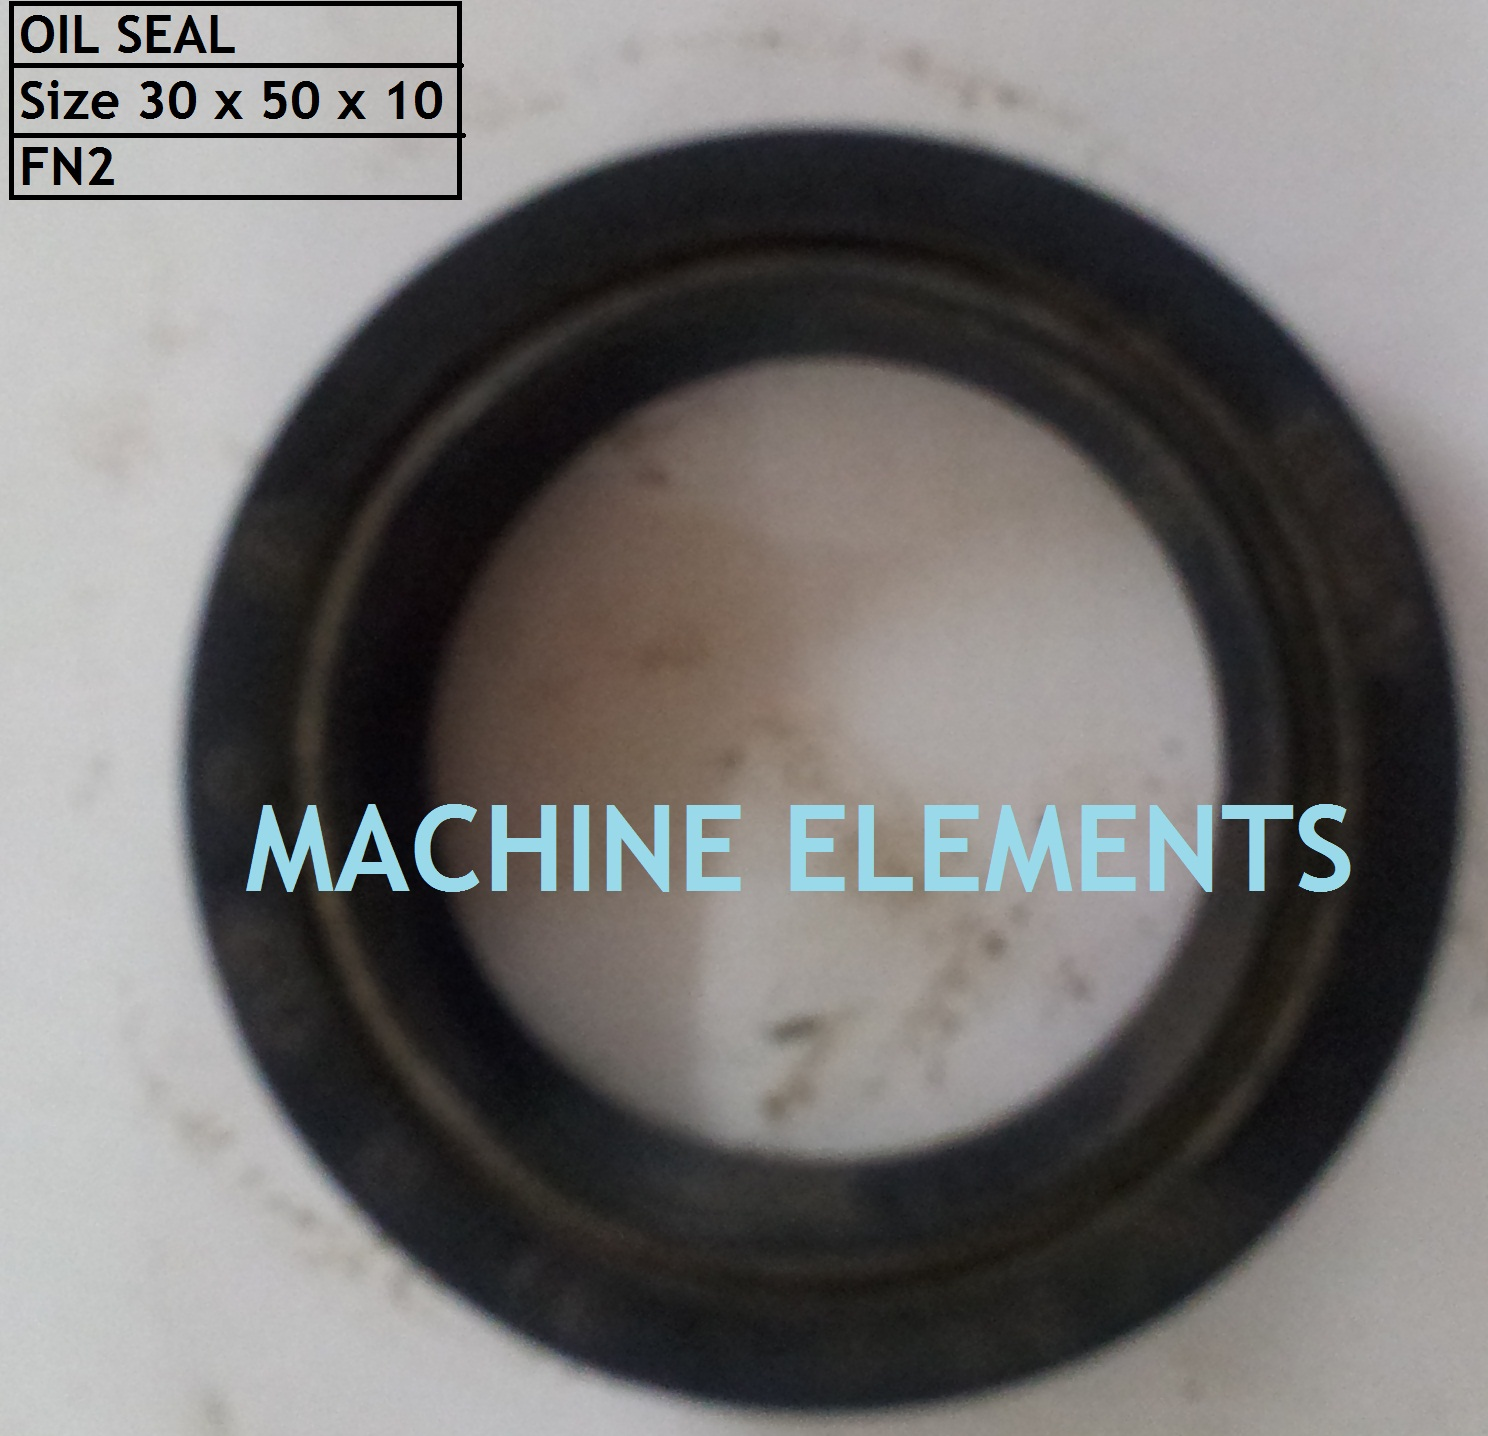 Oil Seal FN2